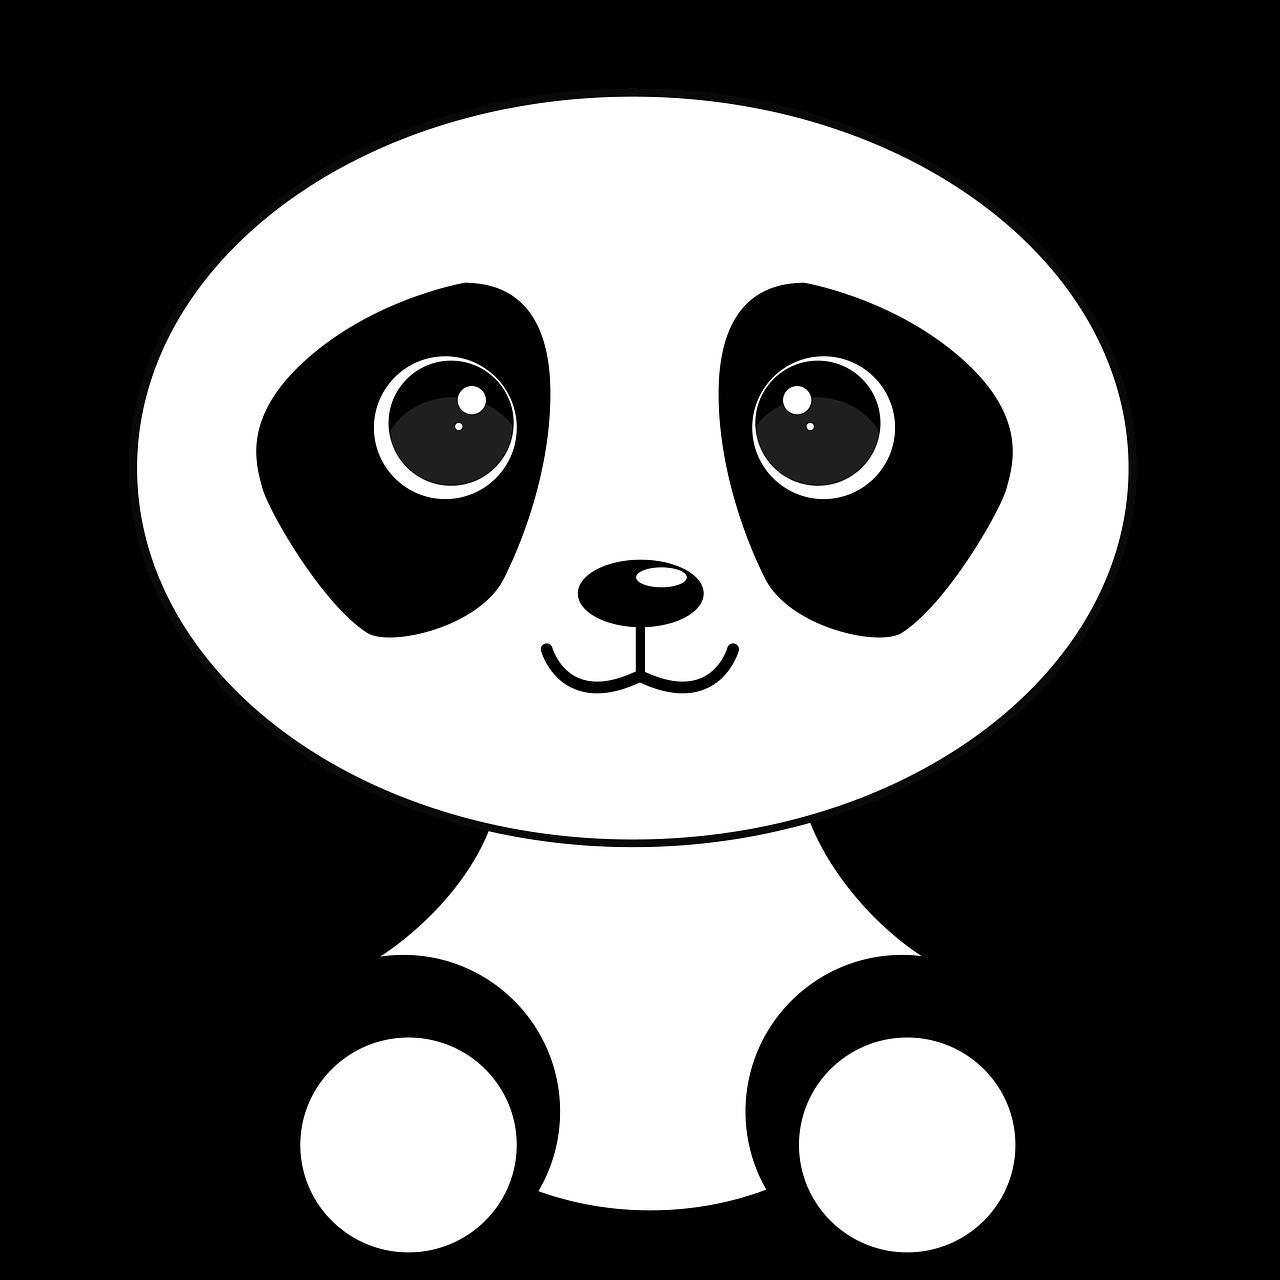 Panda bear halloween clipart graphic transparent Free Image on Pixabay - Bear, Panda Bear, Panda, Animals | Pinterest ... graphic transparent